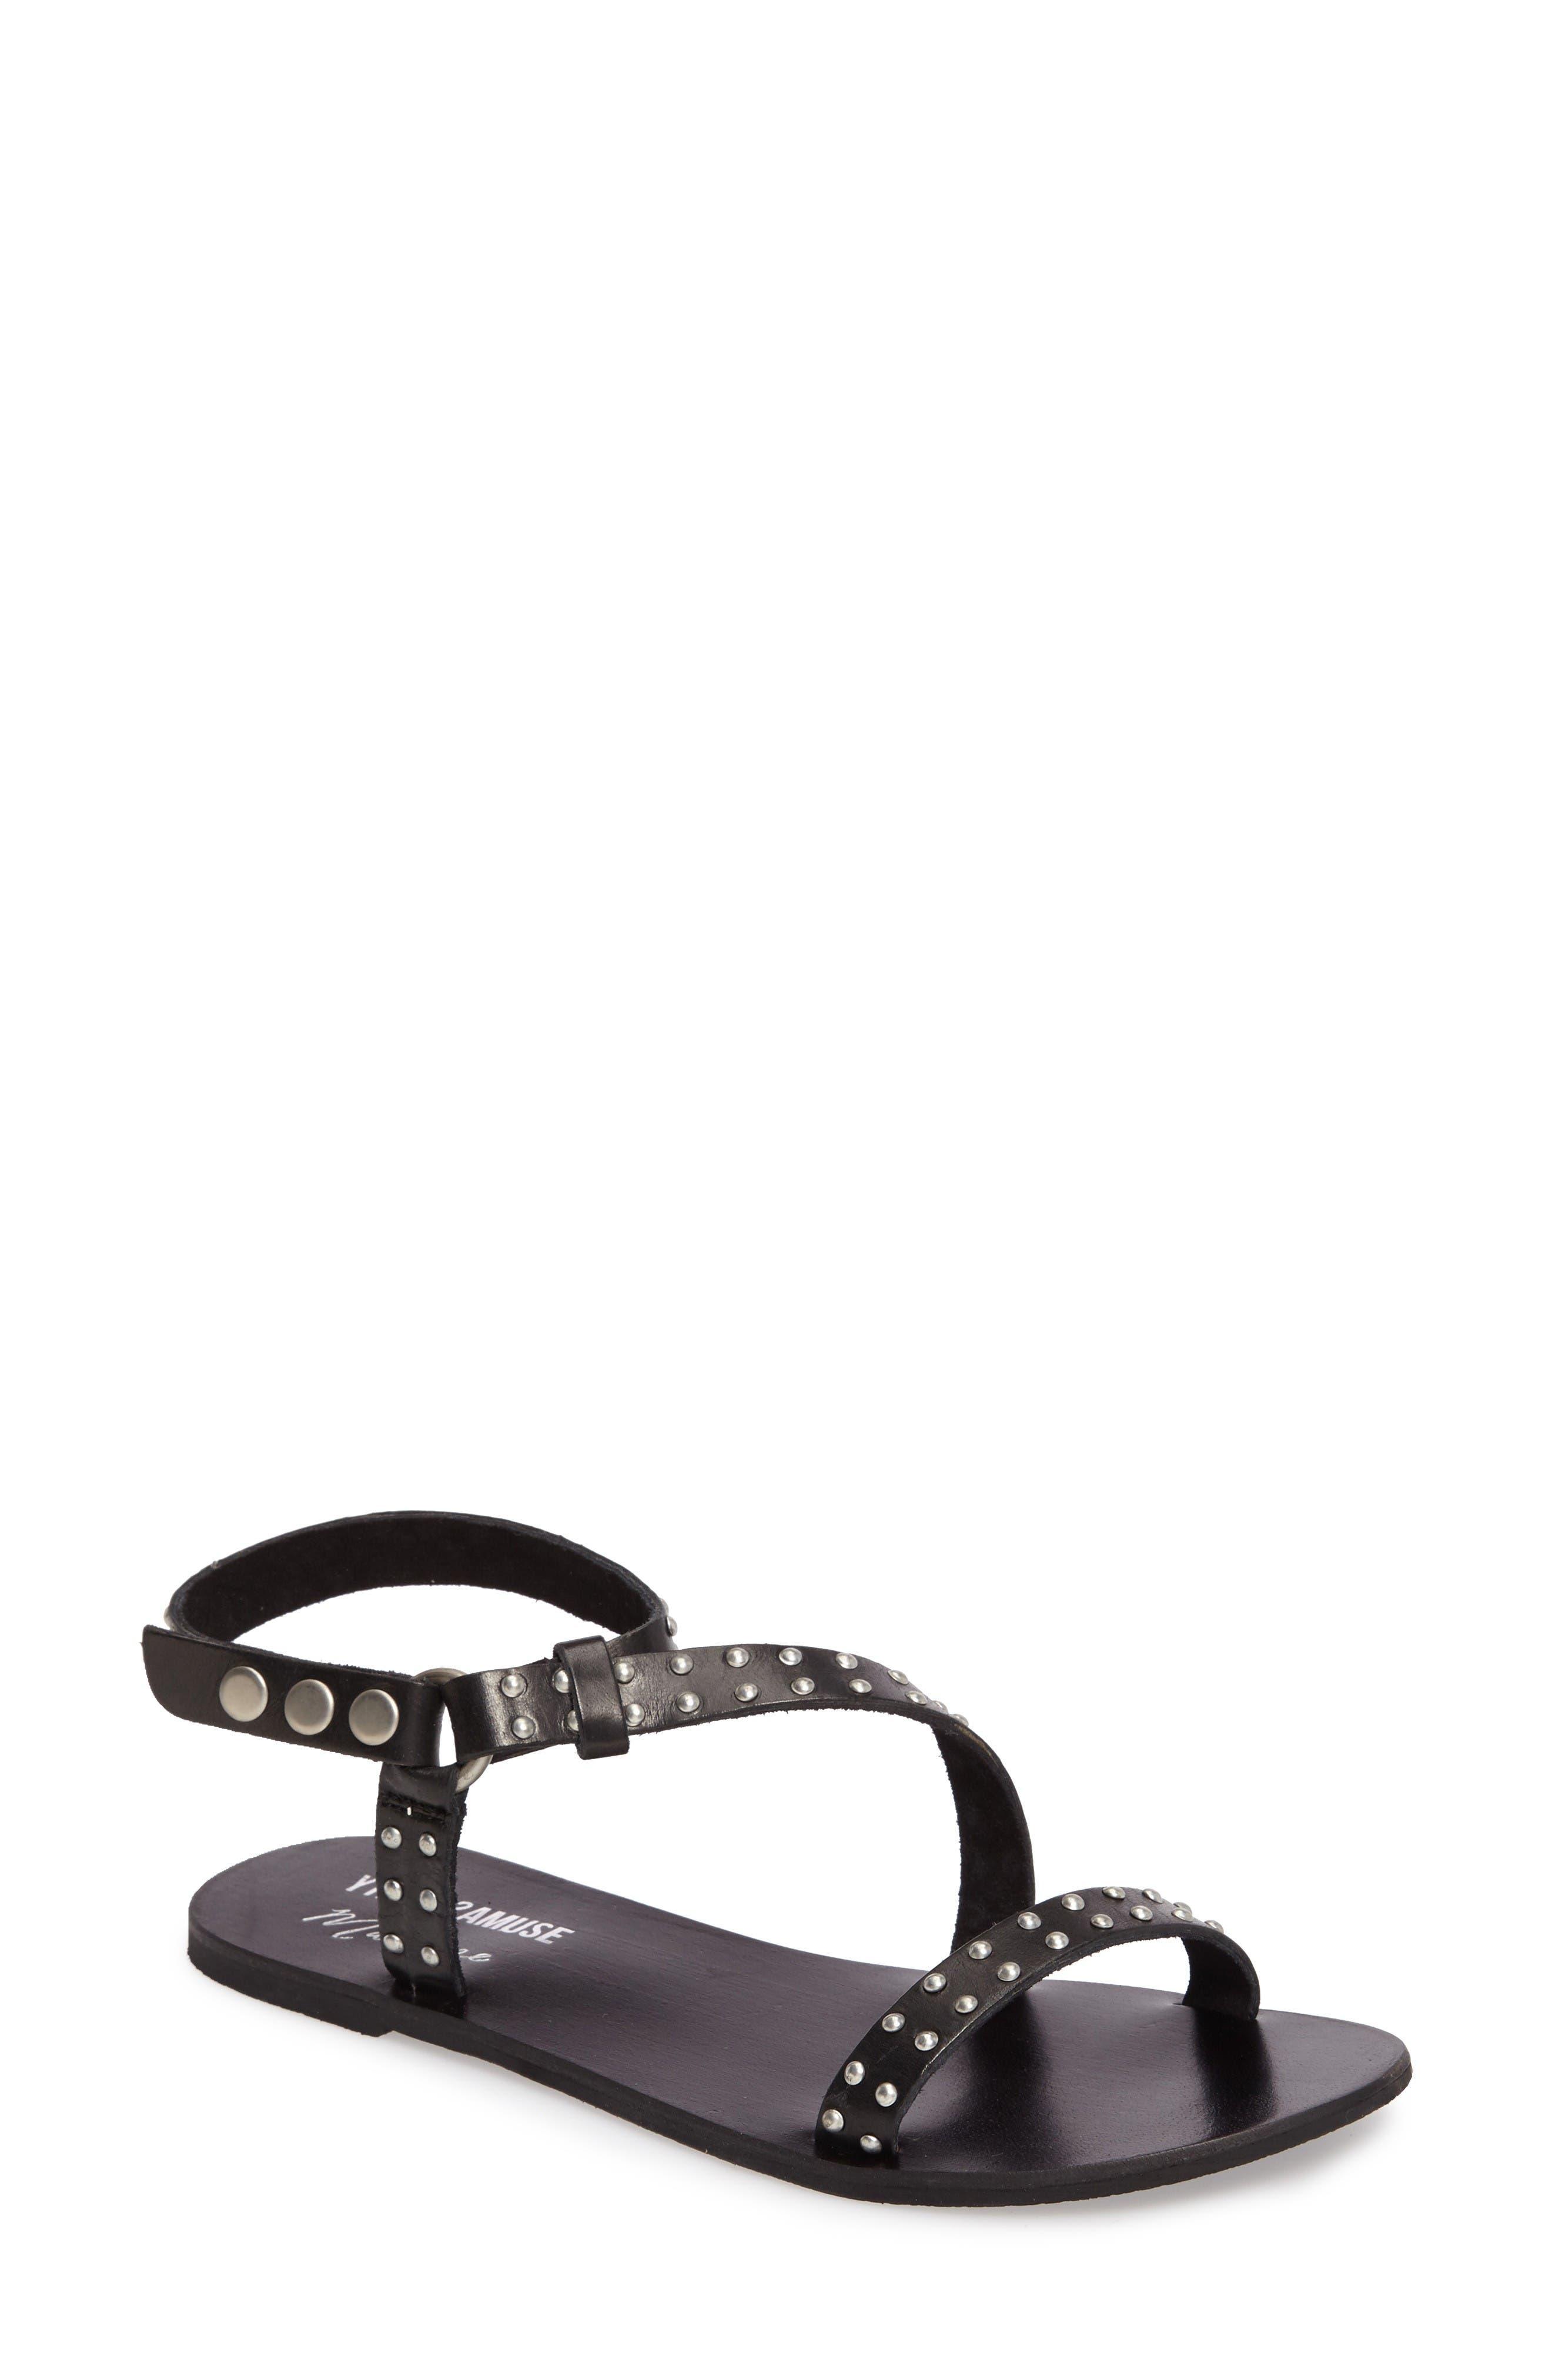 Main Image - Amuse Society x Matisse Rock Muse Studded Sandal (Women)